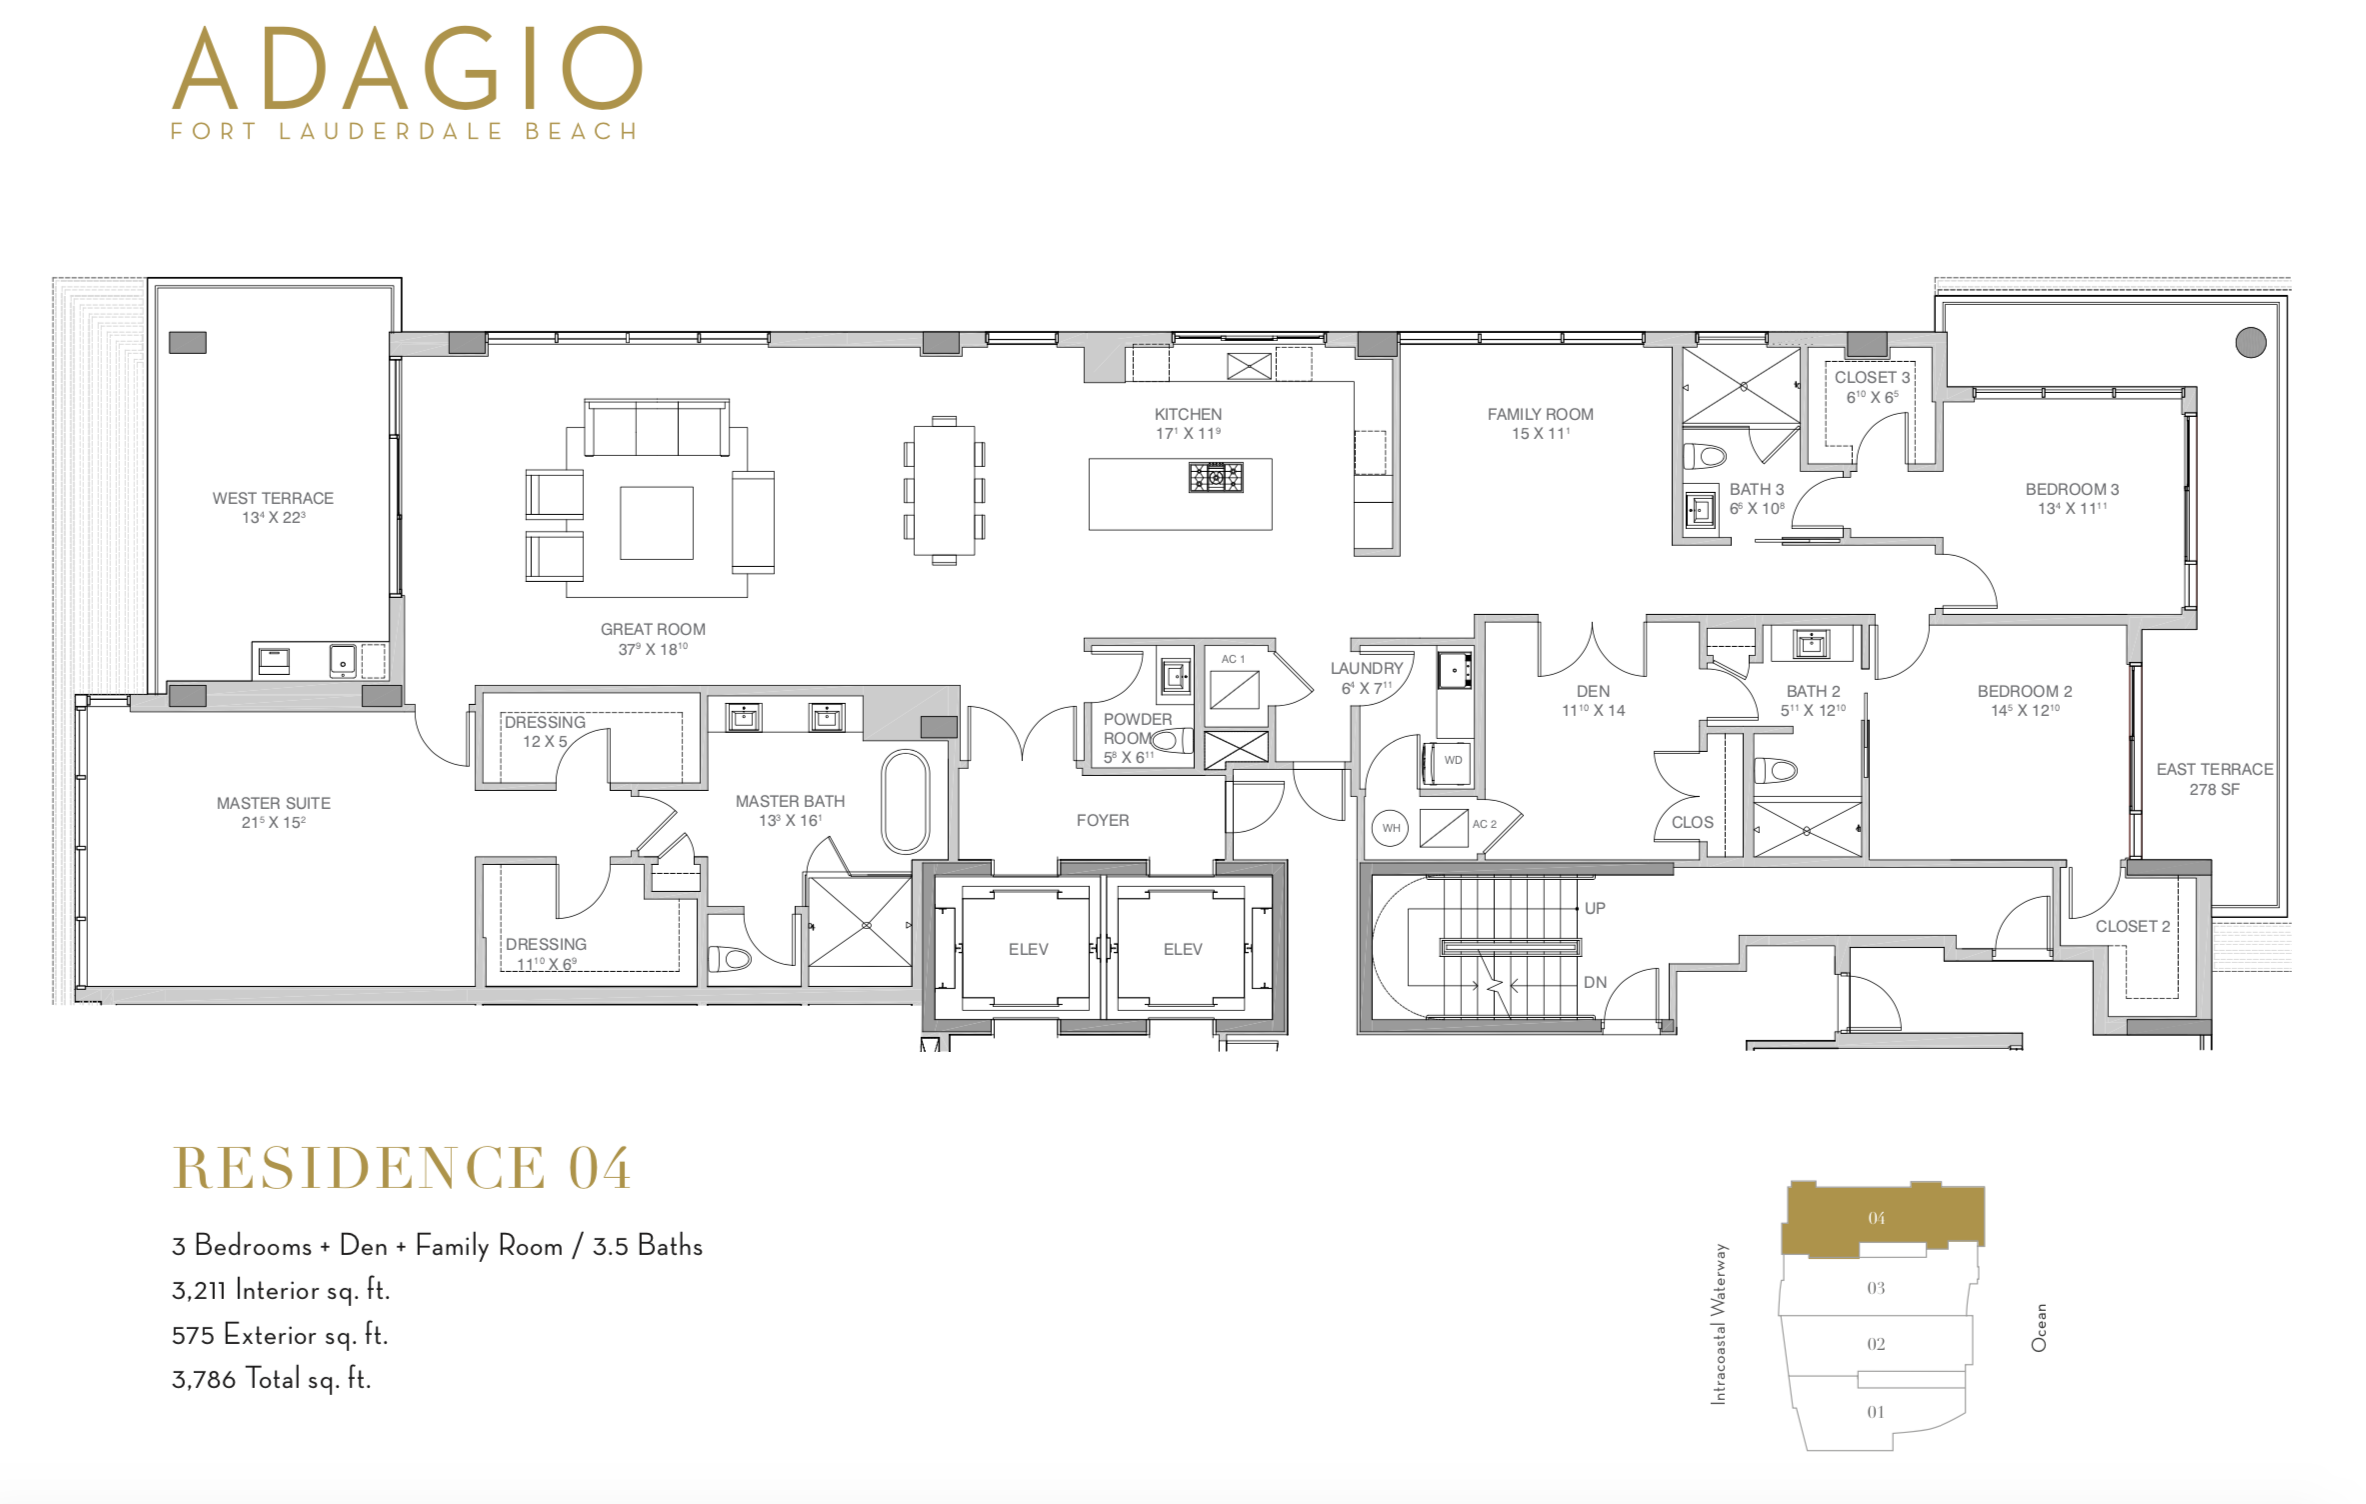 Adagio Fort Lauderdale   Residence 04